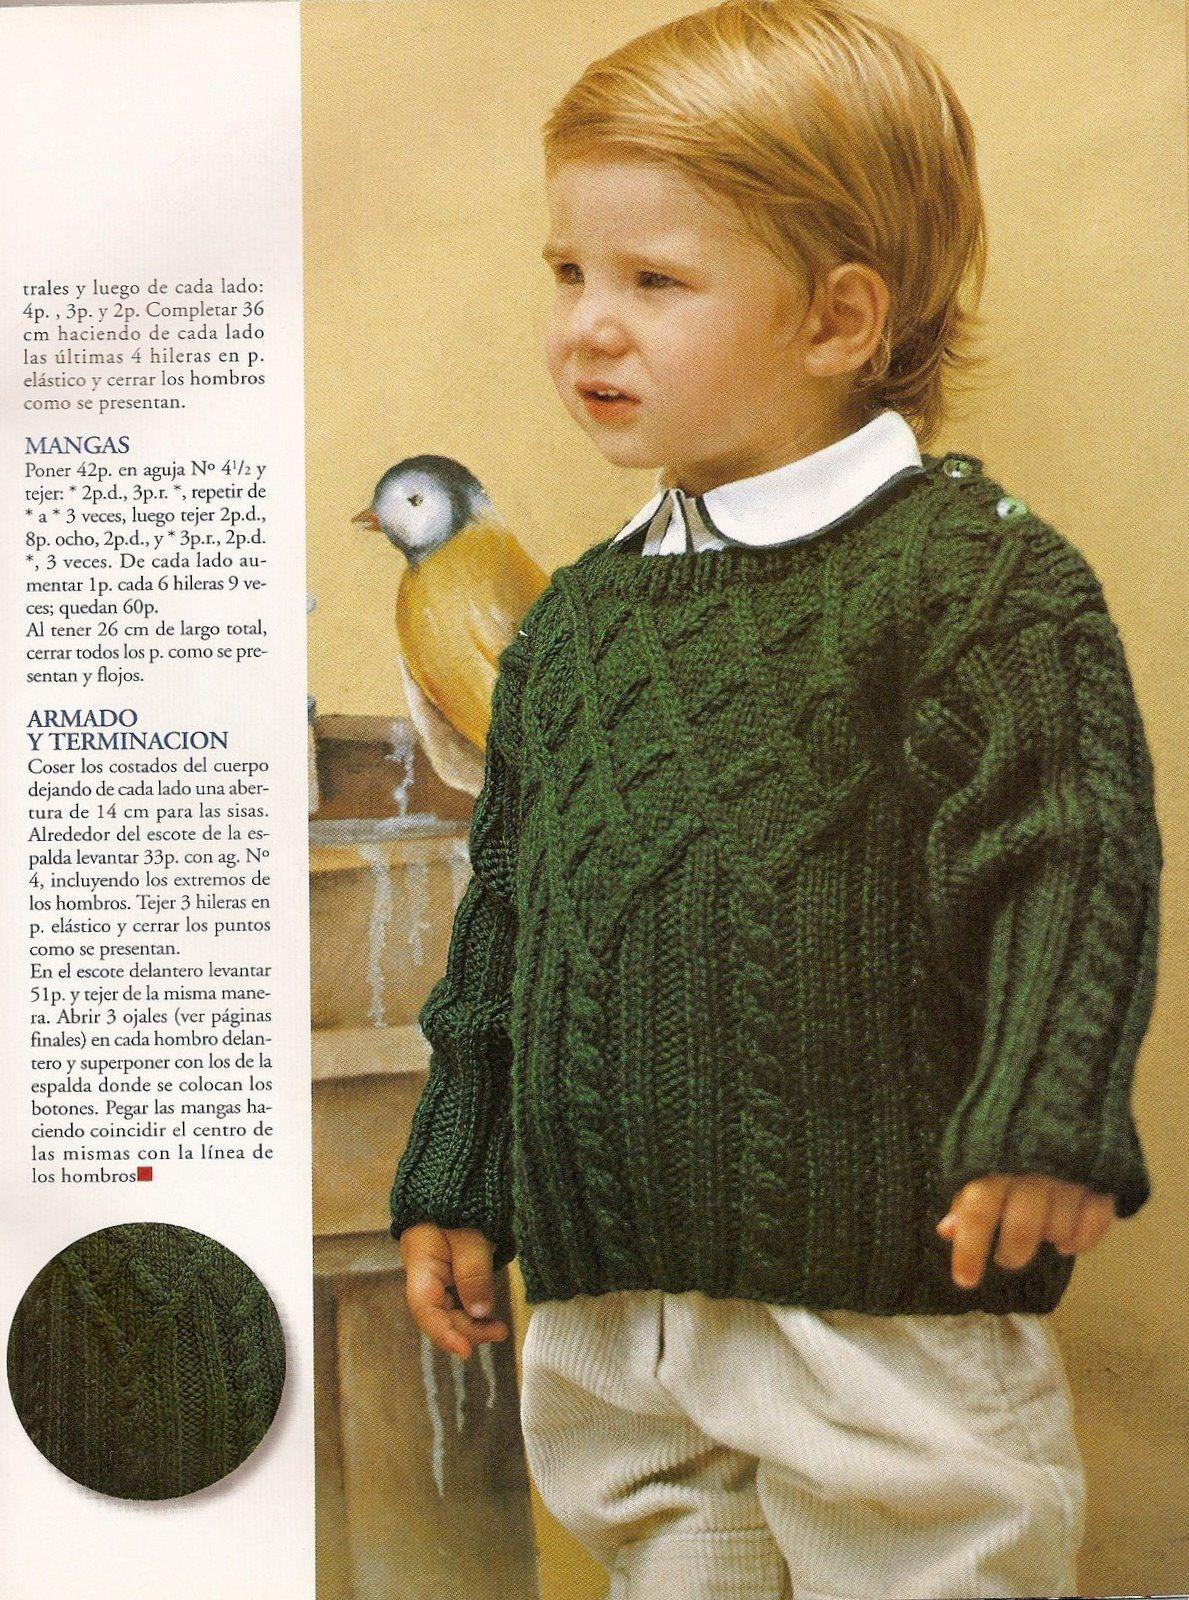 pinterets sacos para niños tejidos en 2 agujas - Saferbrowser Yahoo ...